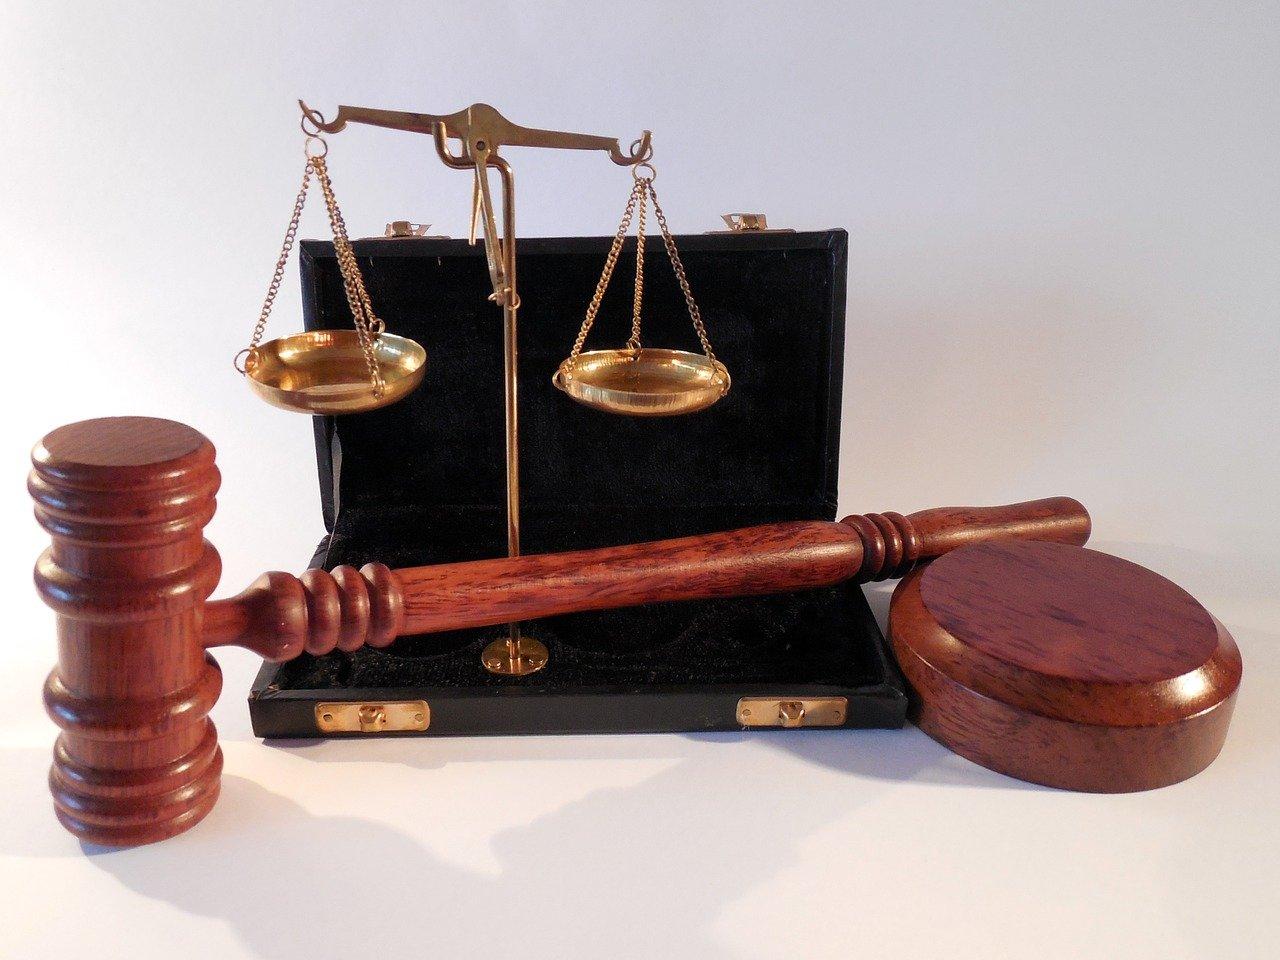 City of Owasso Announces Postponement of January Municipal Court Dockets